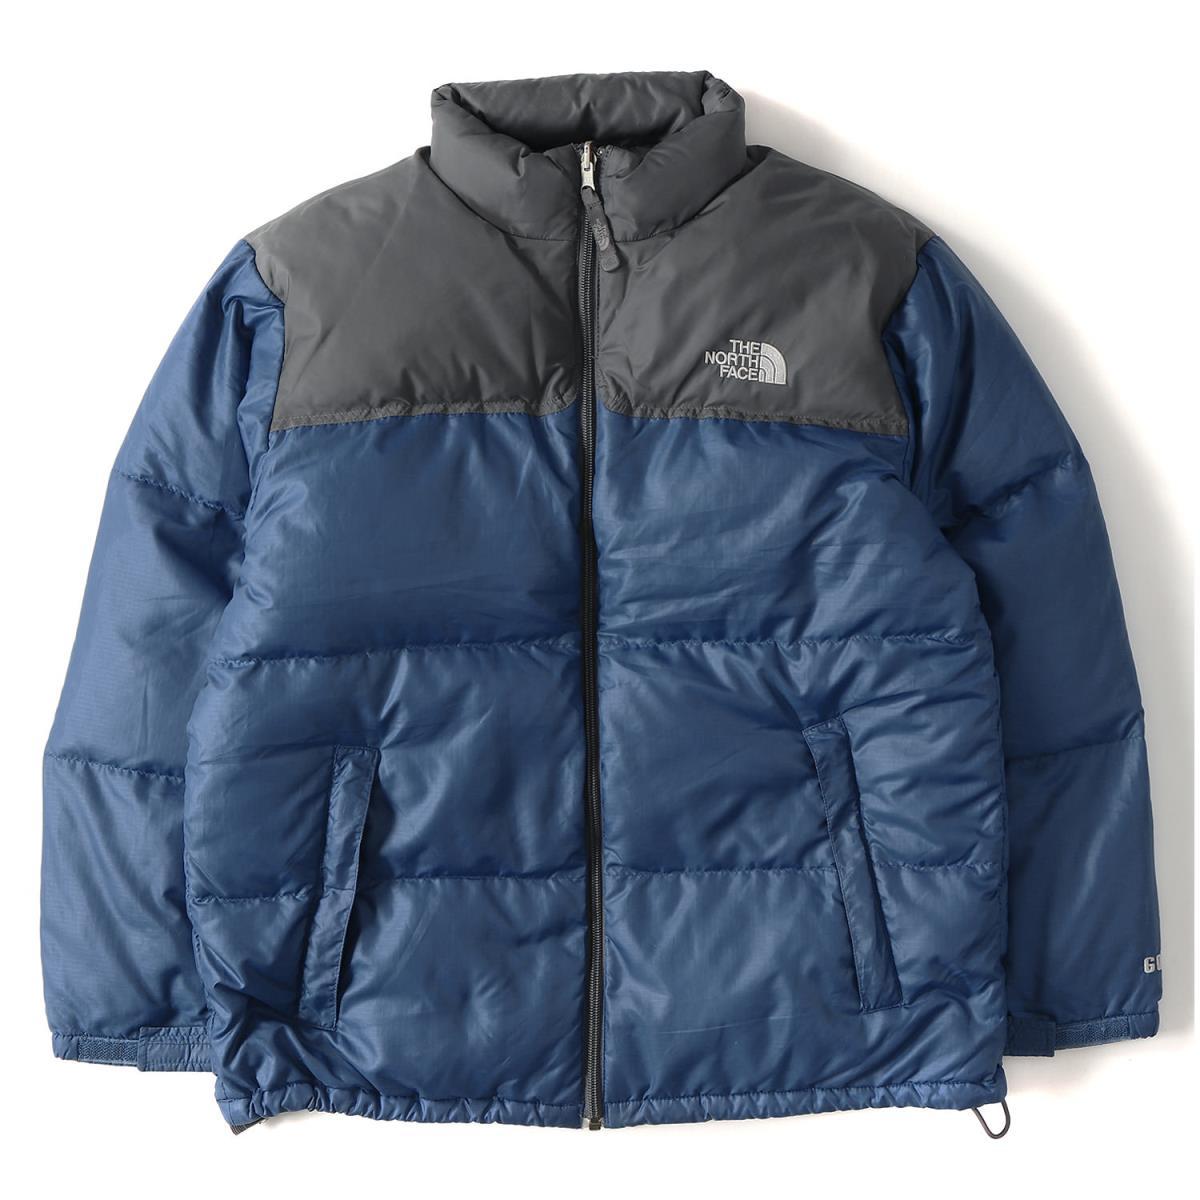 3376203278 ... where can i buy the north face the north face nuptse jacket navy x gray  boys